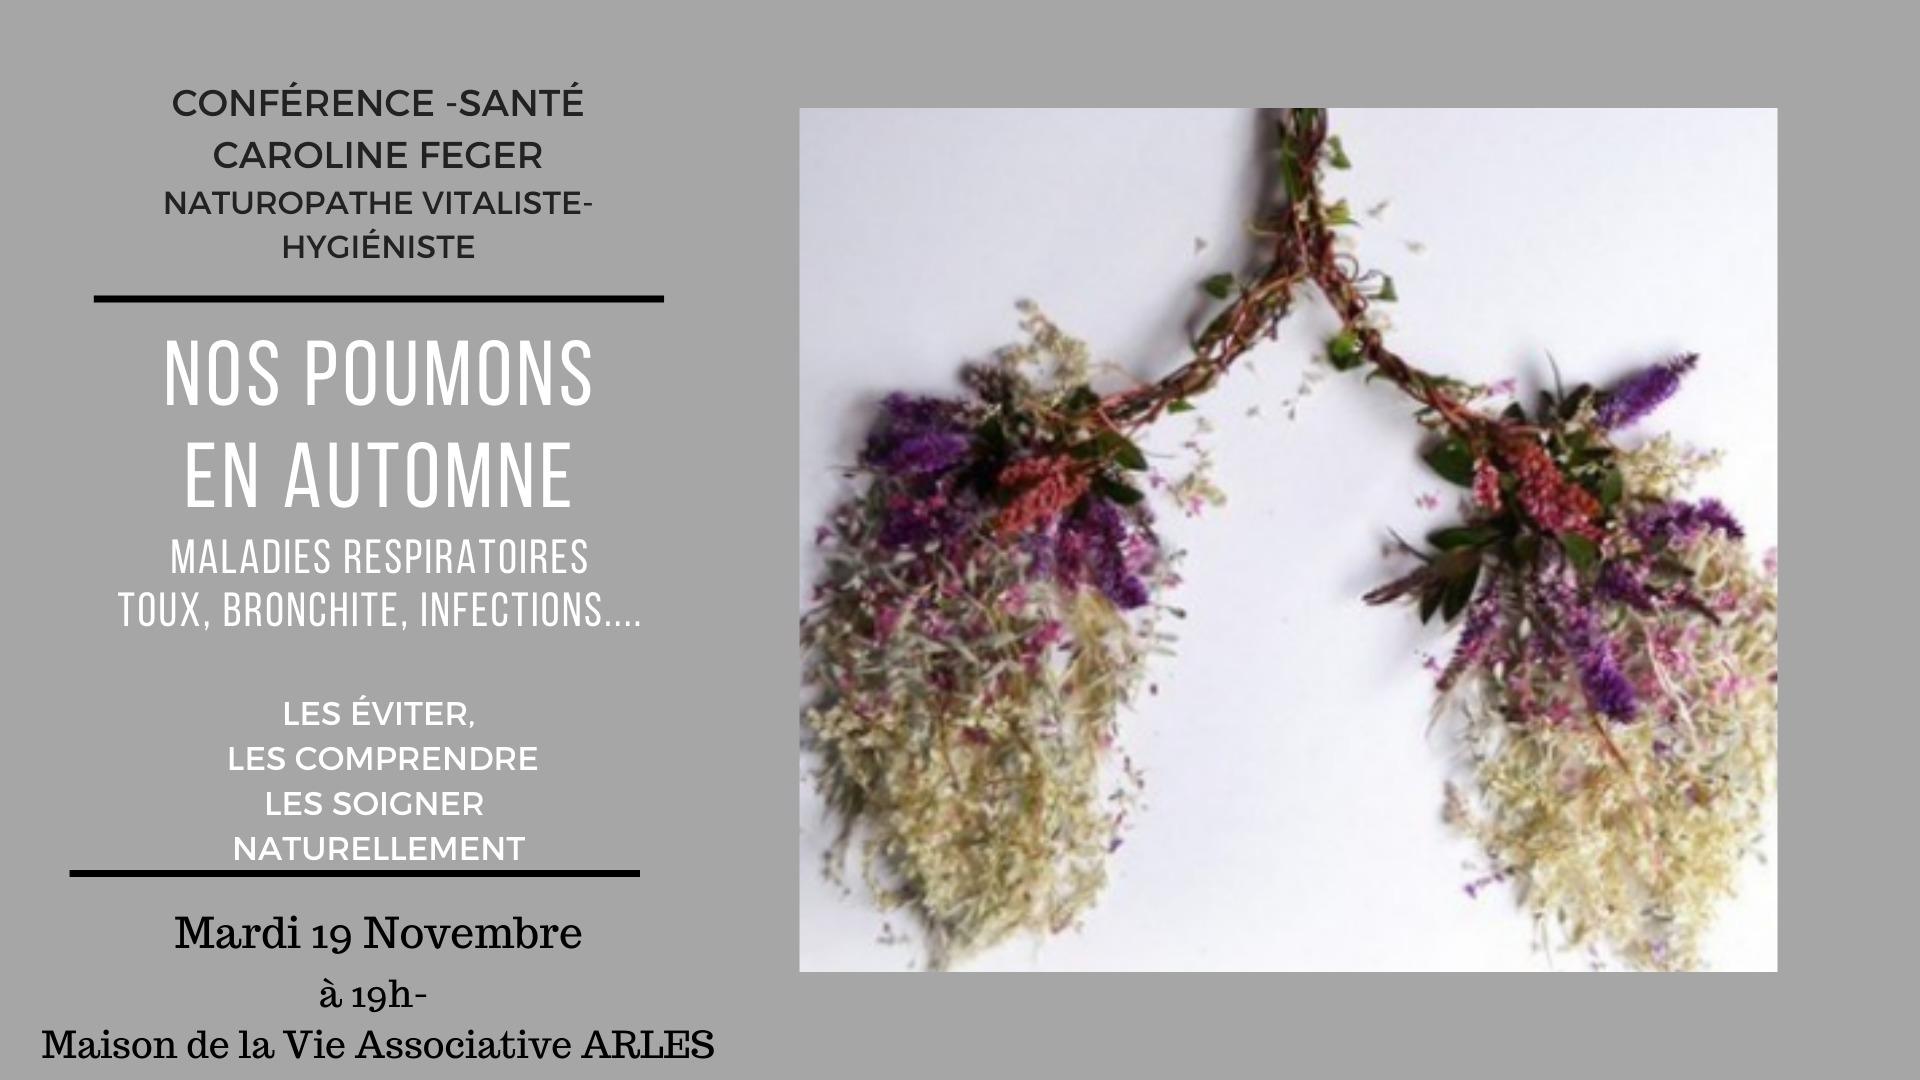 Caroline Feger, naturopathe vitaliste parlera des maladies respiratoires : toux, bronchite, Infections...